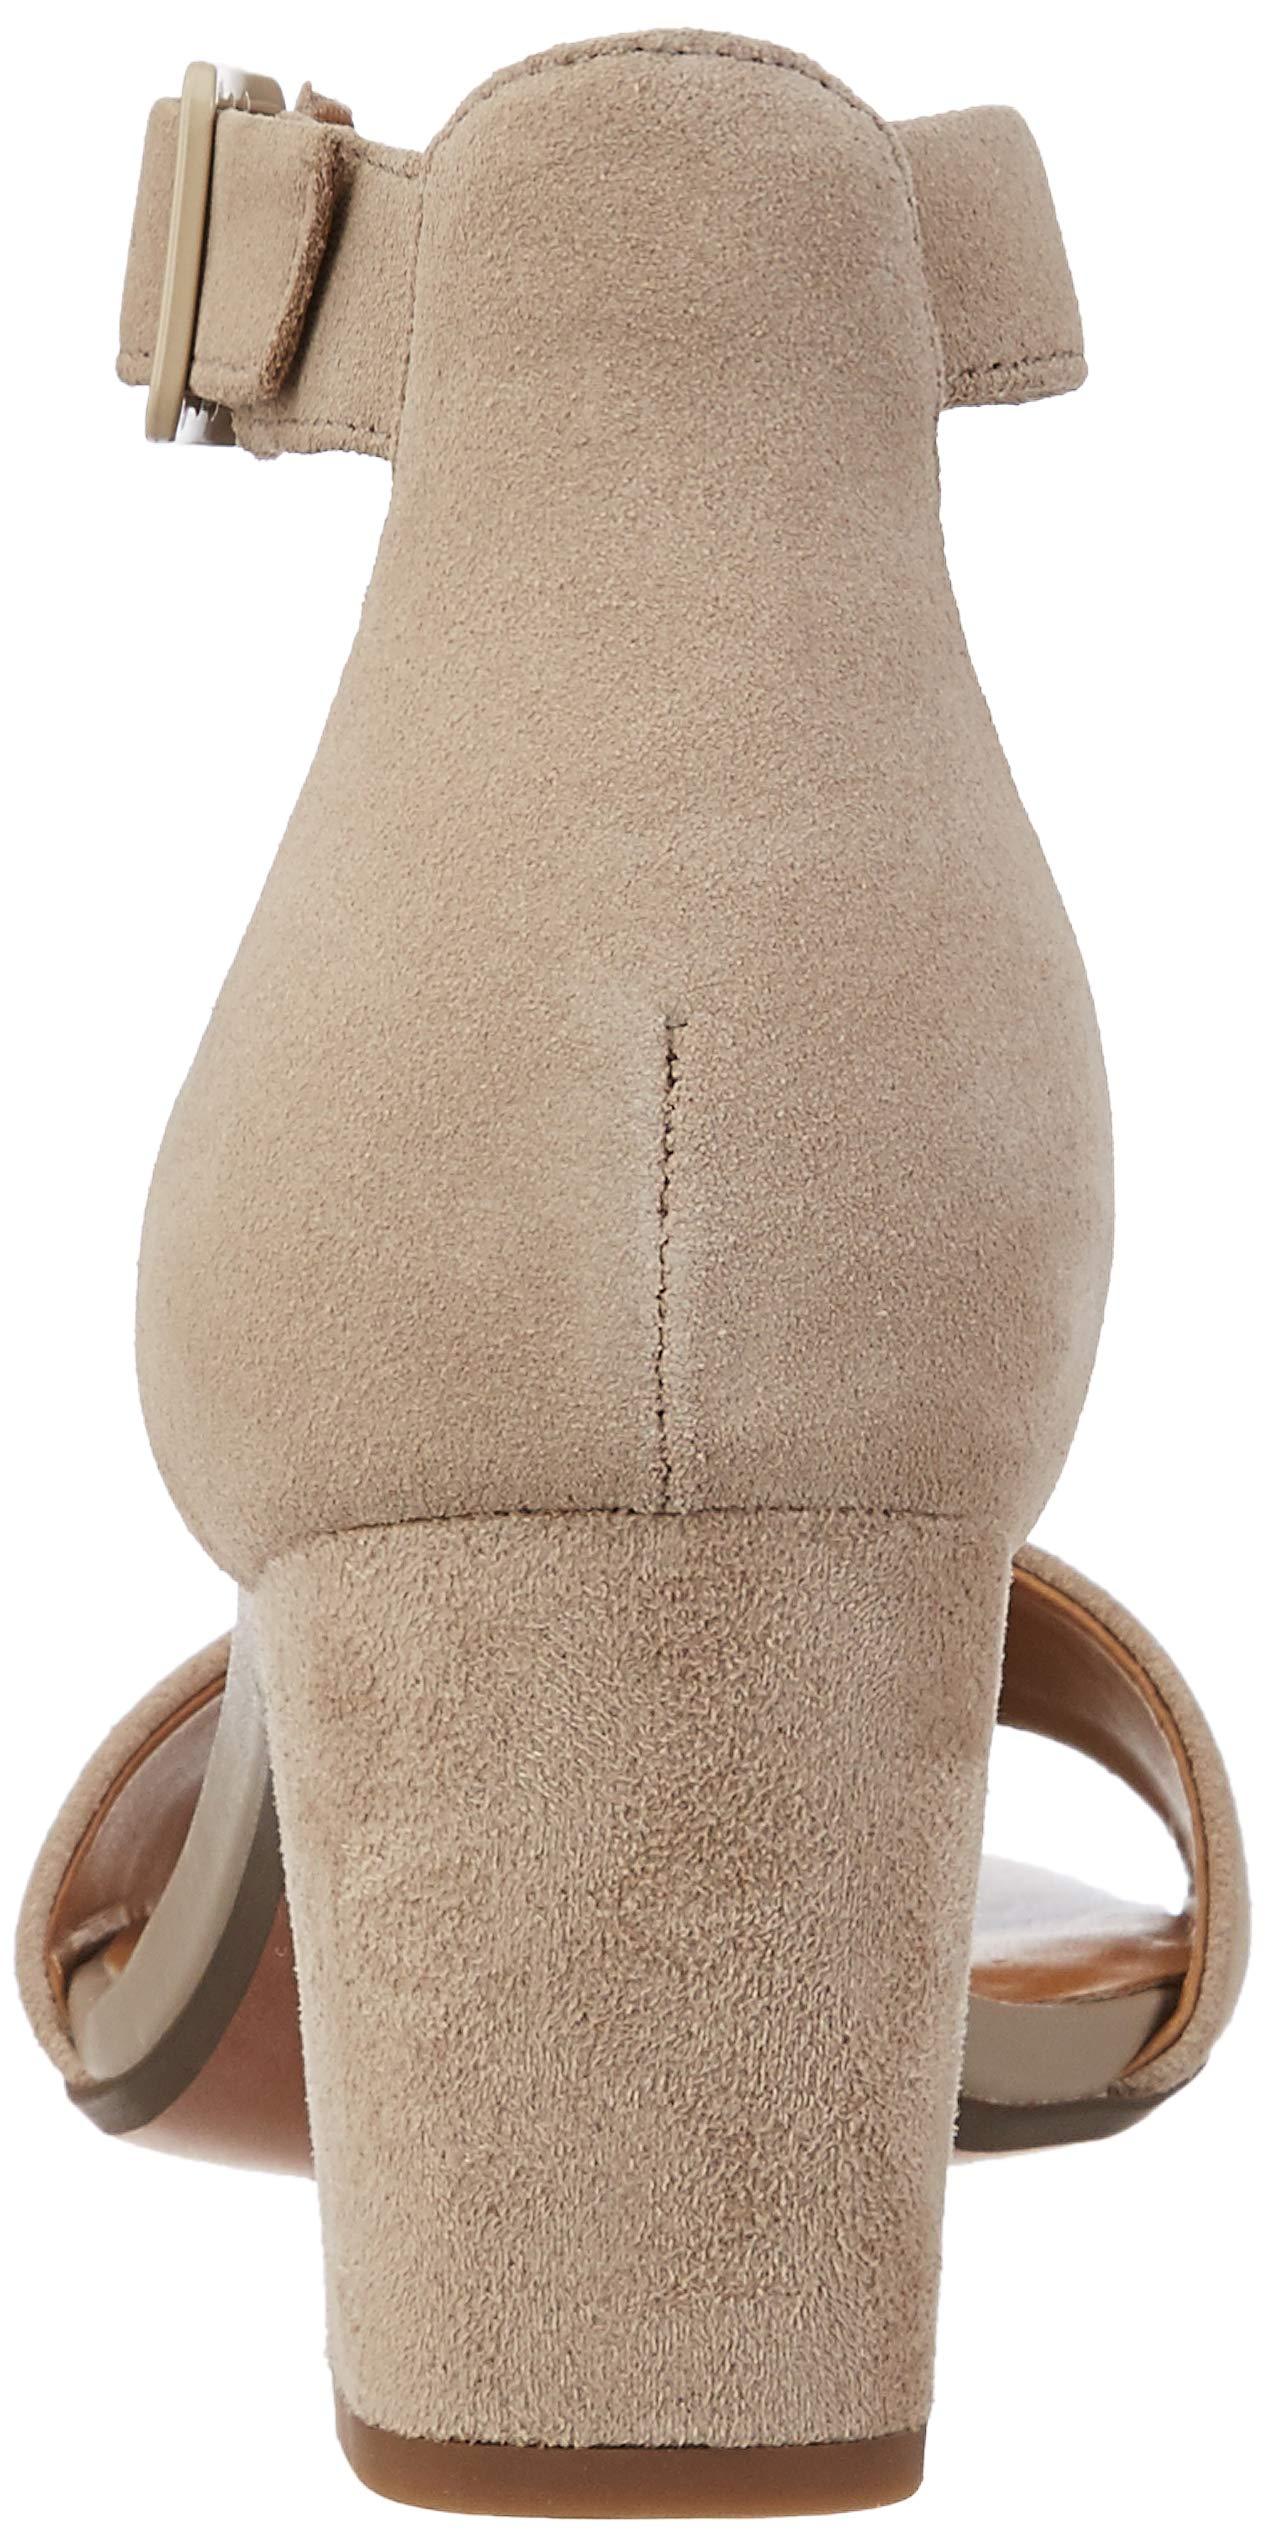 b9b652660f7 Clarks Women s Deva Mae Fashion Sandals - Gia Designer